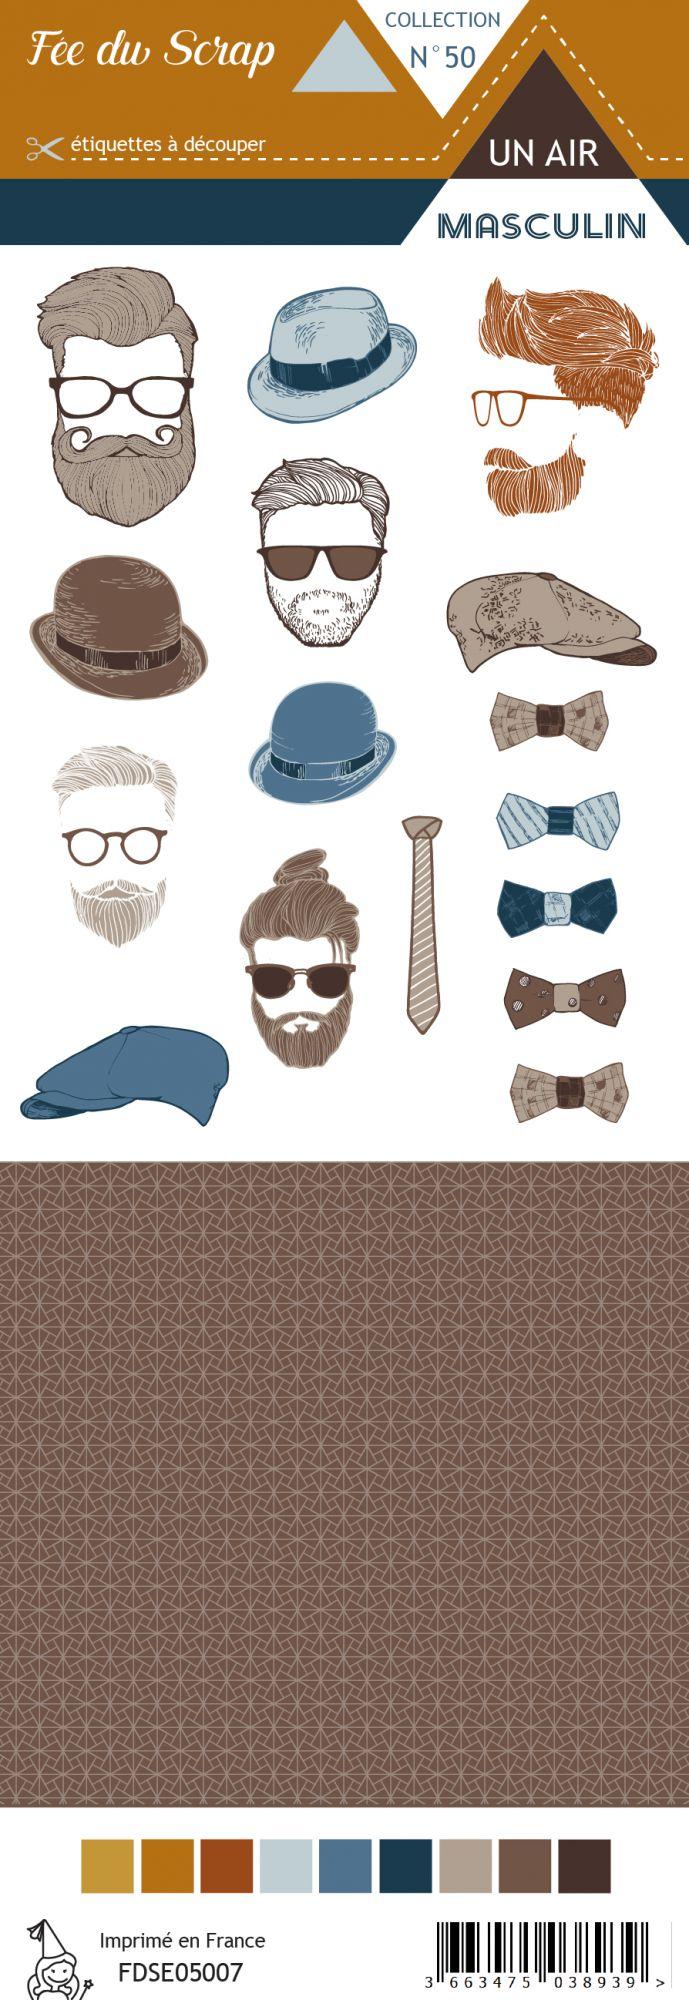 Etiquette un air masculin - Hipster